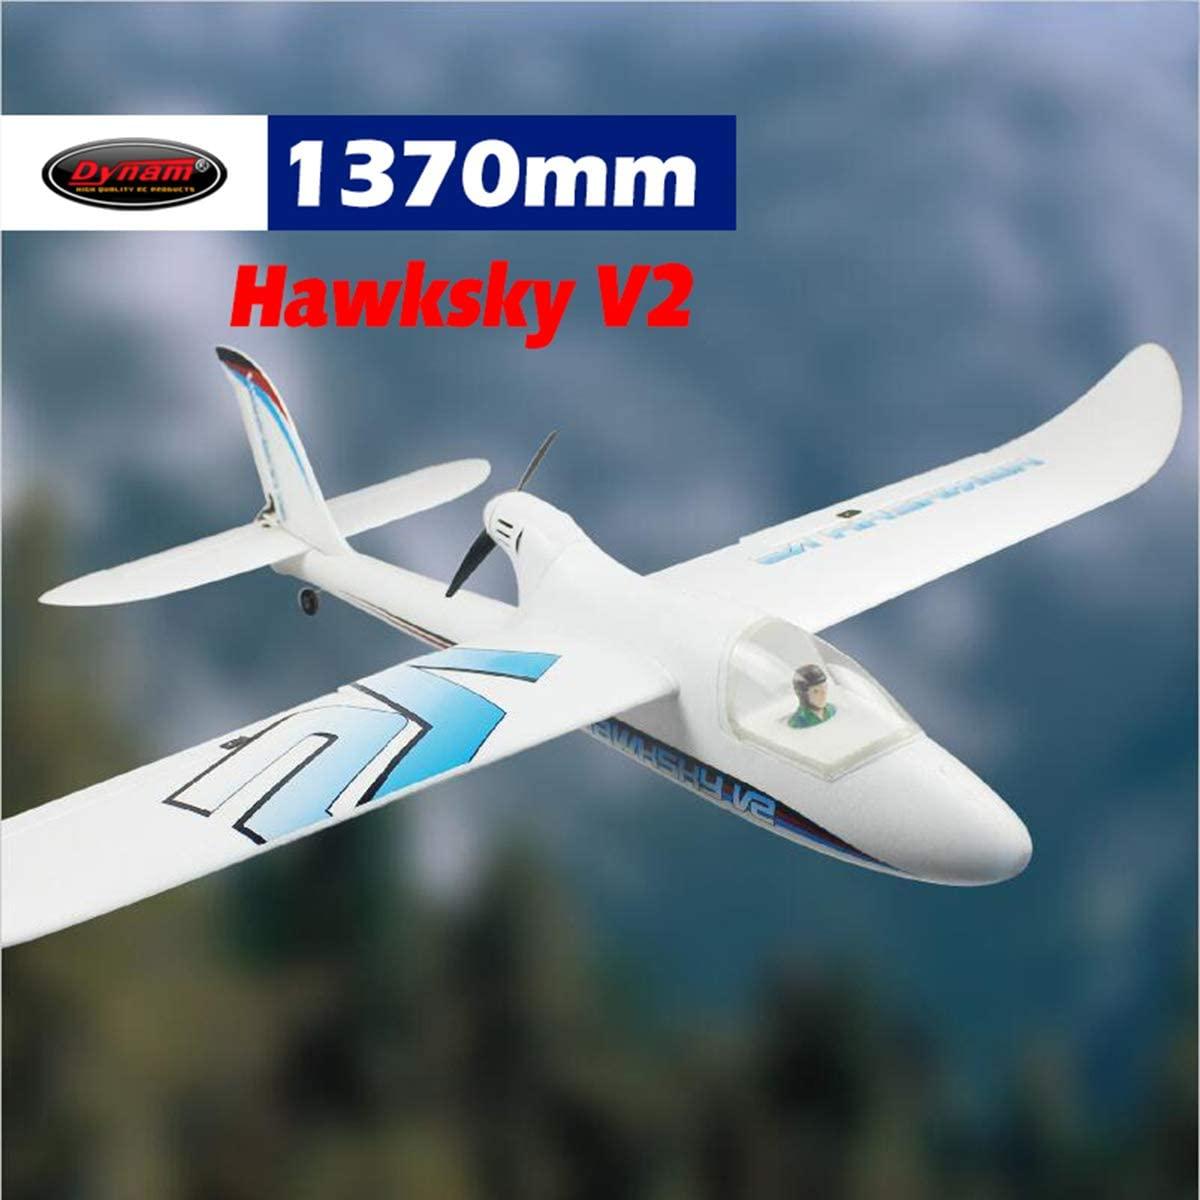 DYNAM RC Trainer Airplane Hawksky V2 1370mm Wingspan-PNP